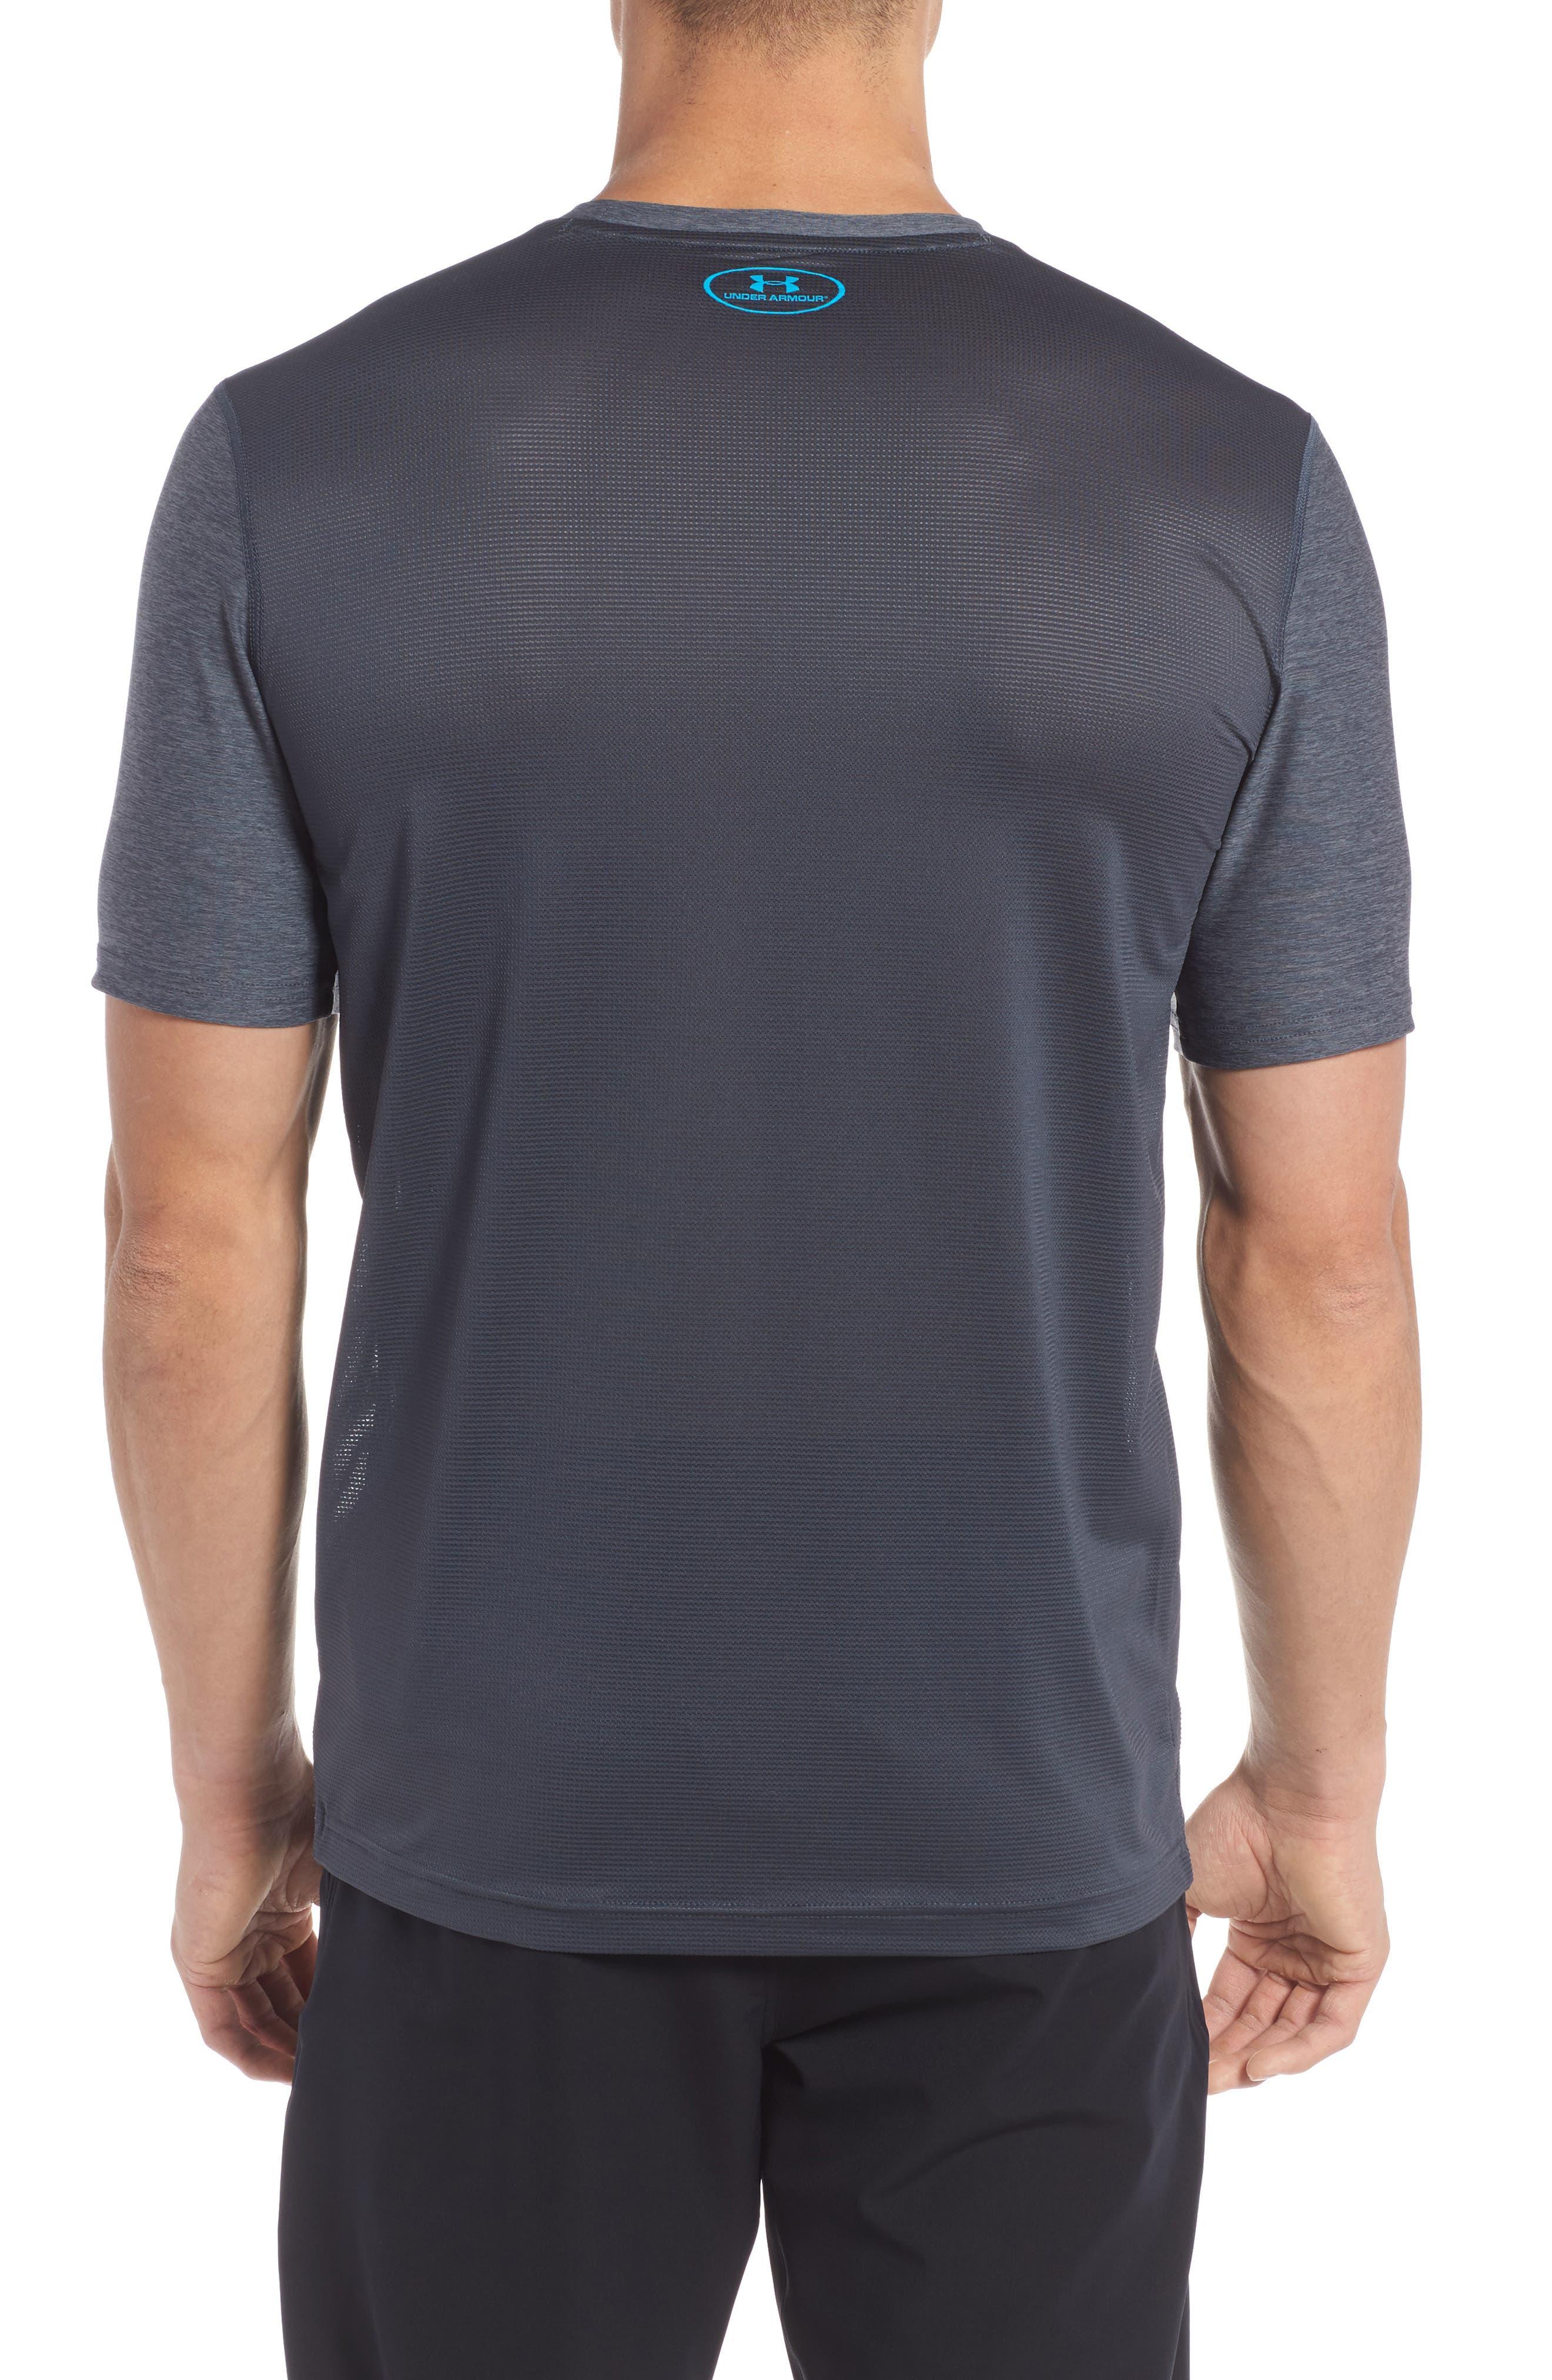 Raid Graphic T-Shirt,                             Alternate thumbnail 2, color,                             Stealth Grey / / Blue Shift